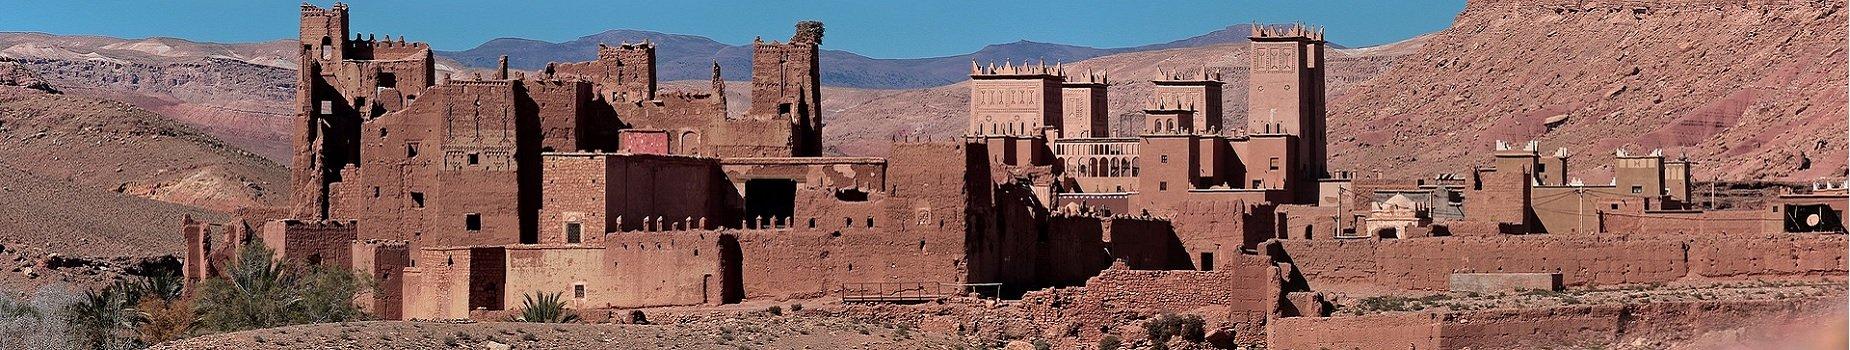 Vliegvelden Marokko